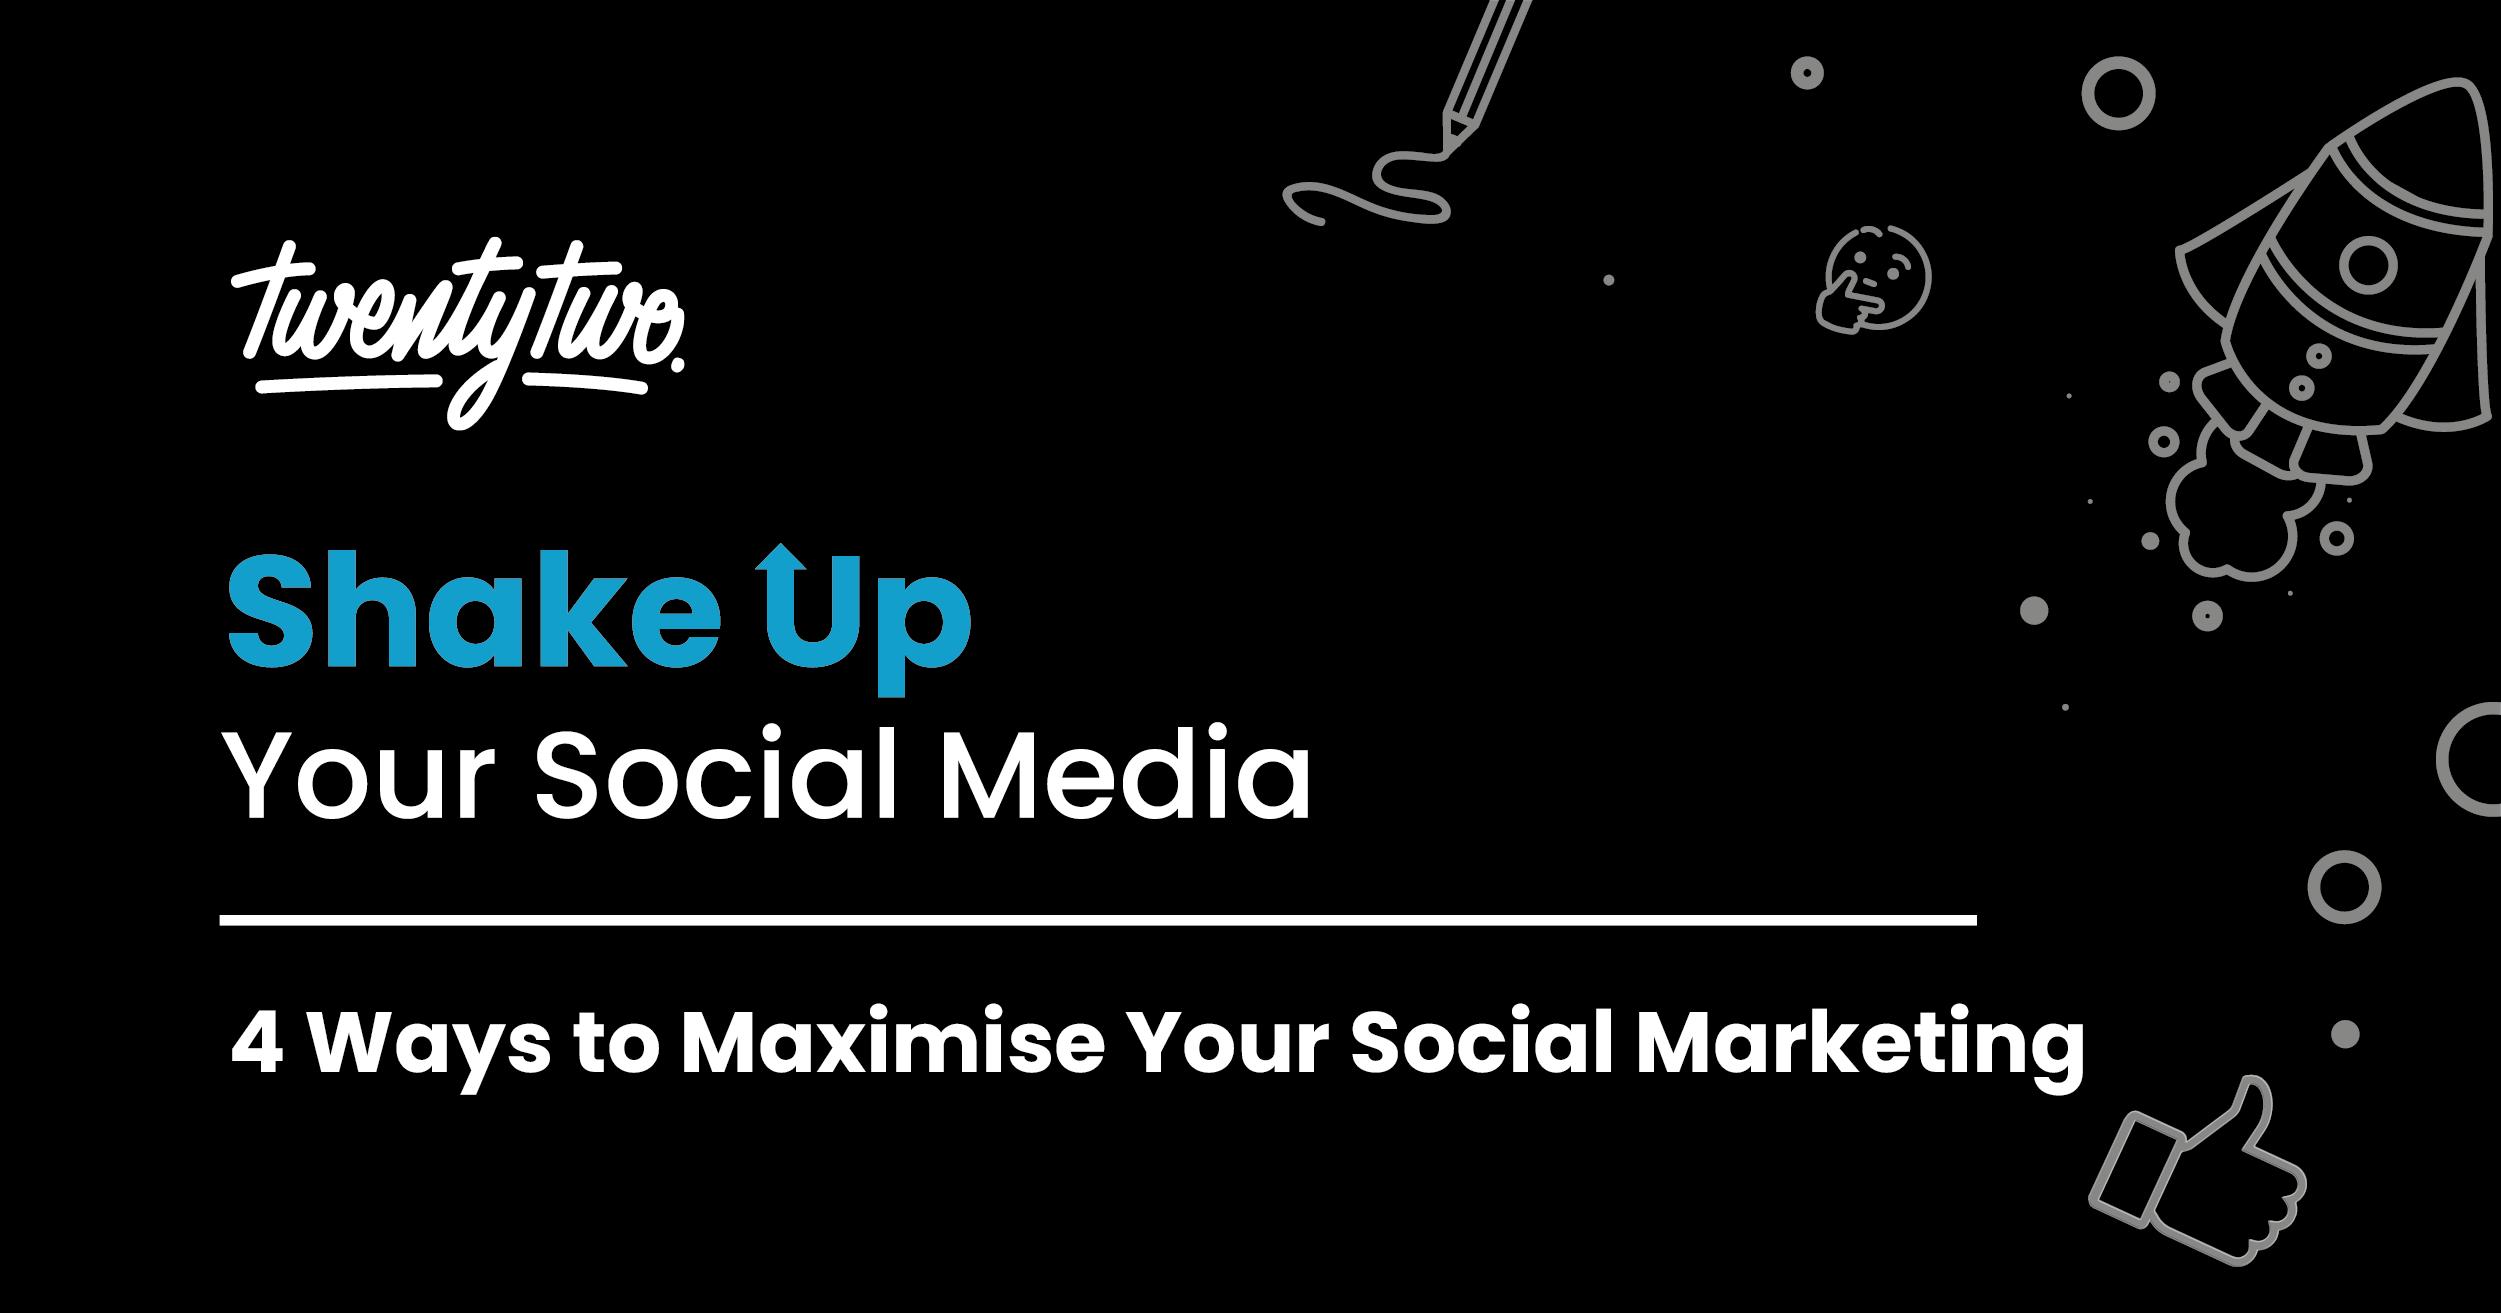 4 ways to maximise your social marketing